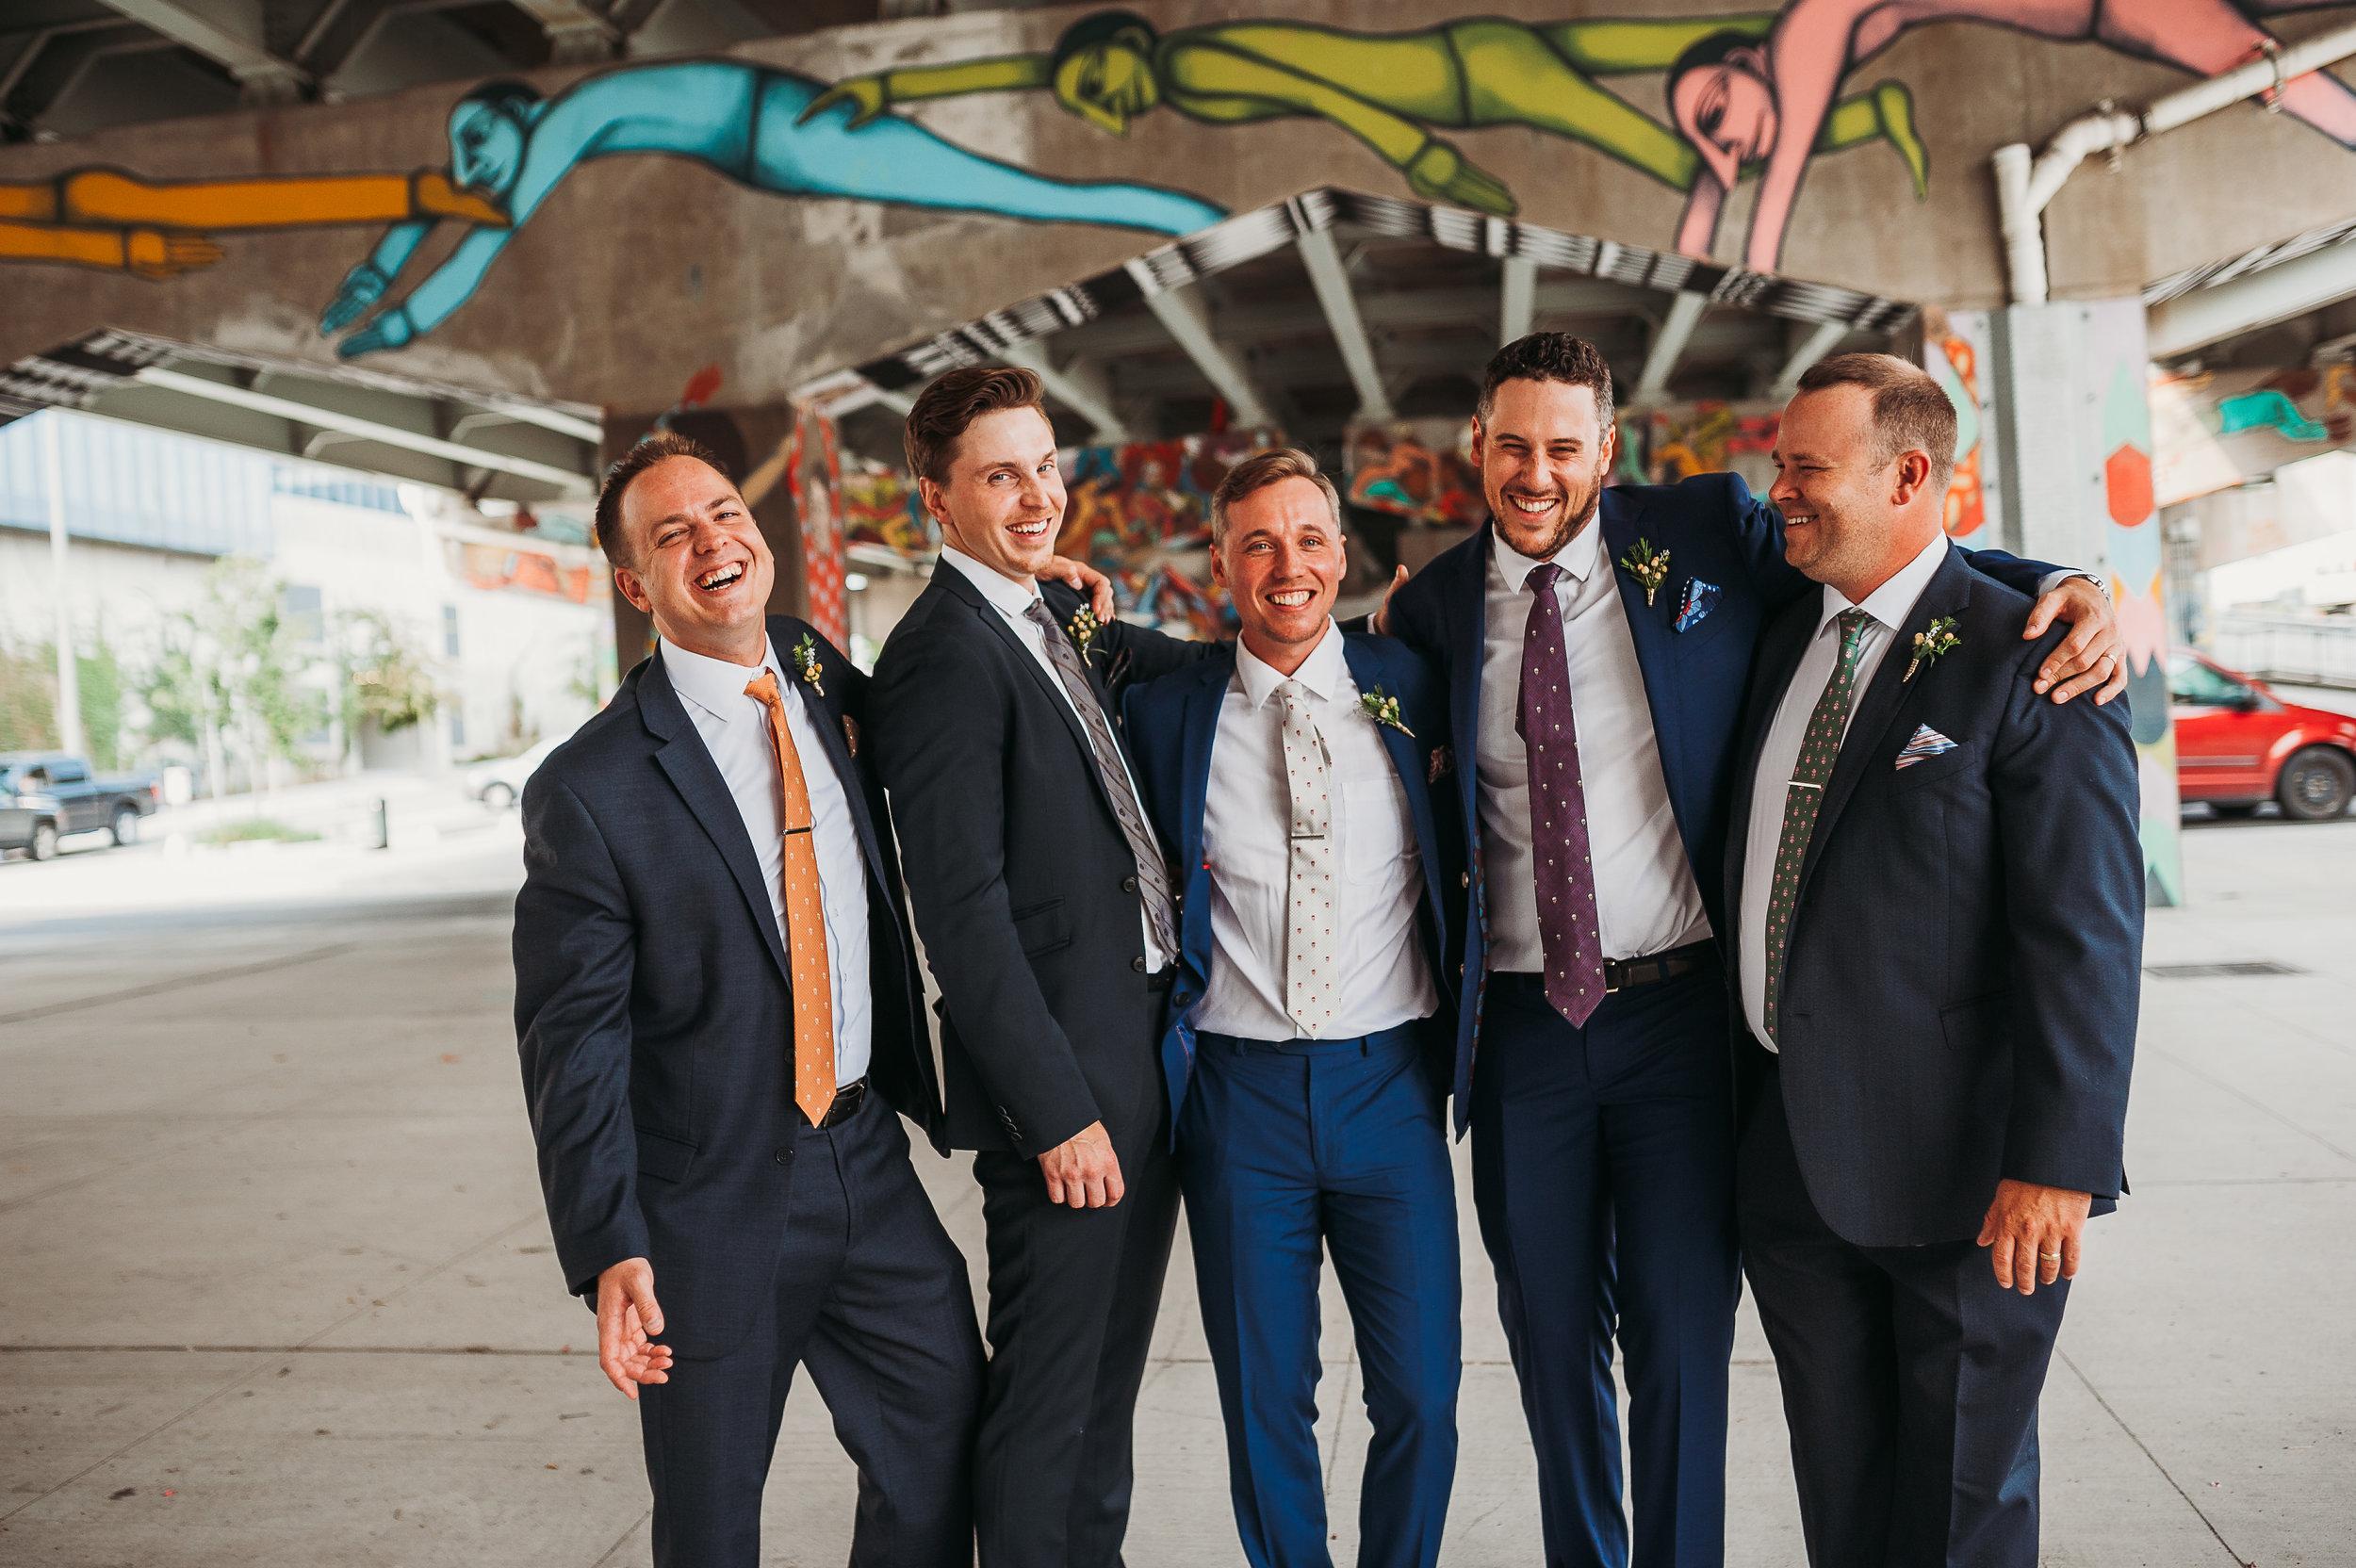 groomsmen-pictures-underpass-park-toronto-rustic-boho-airship37-wedding-by-willow-birch-photo-toronto-documentary-wedding-photographers.jpg